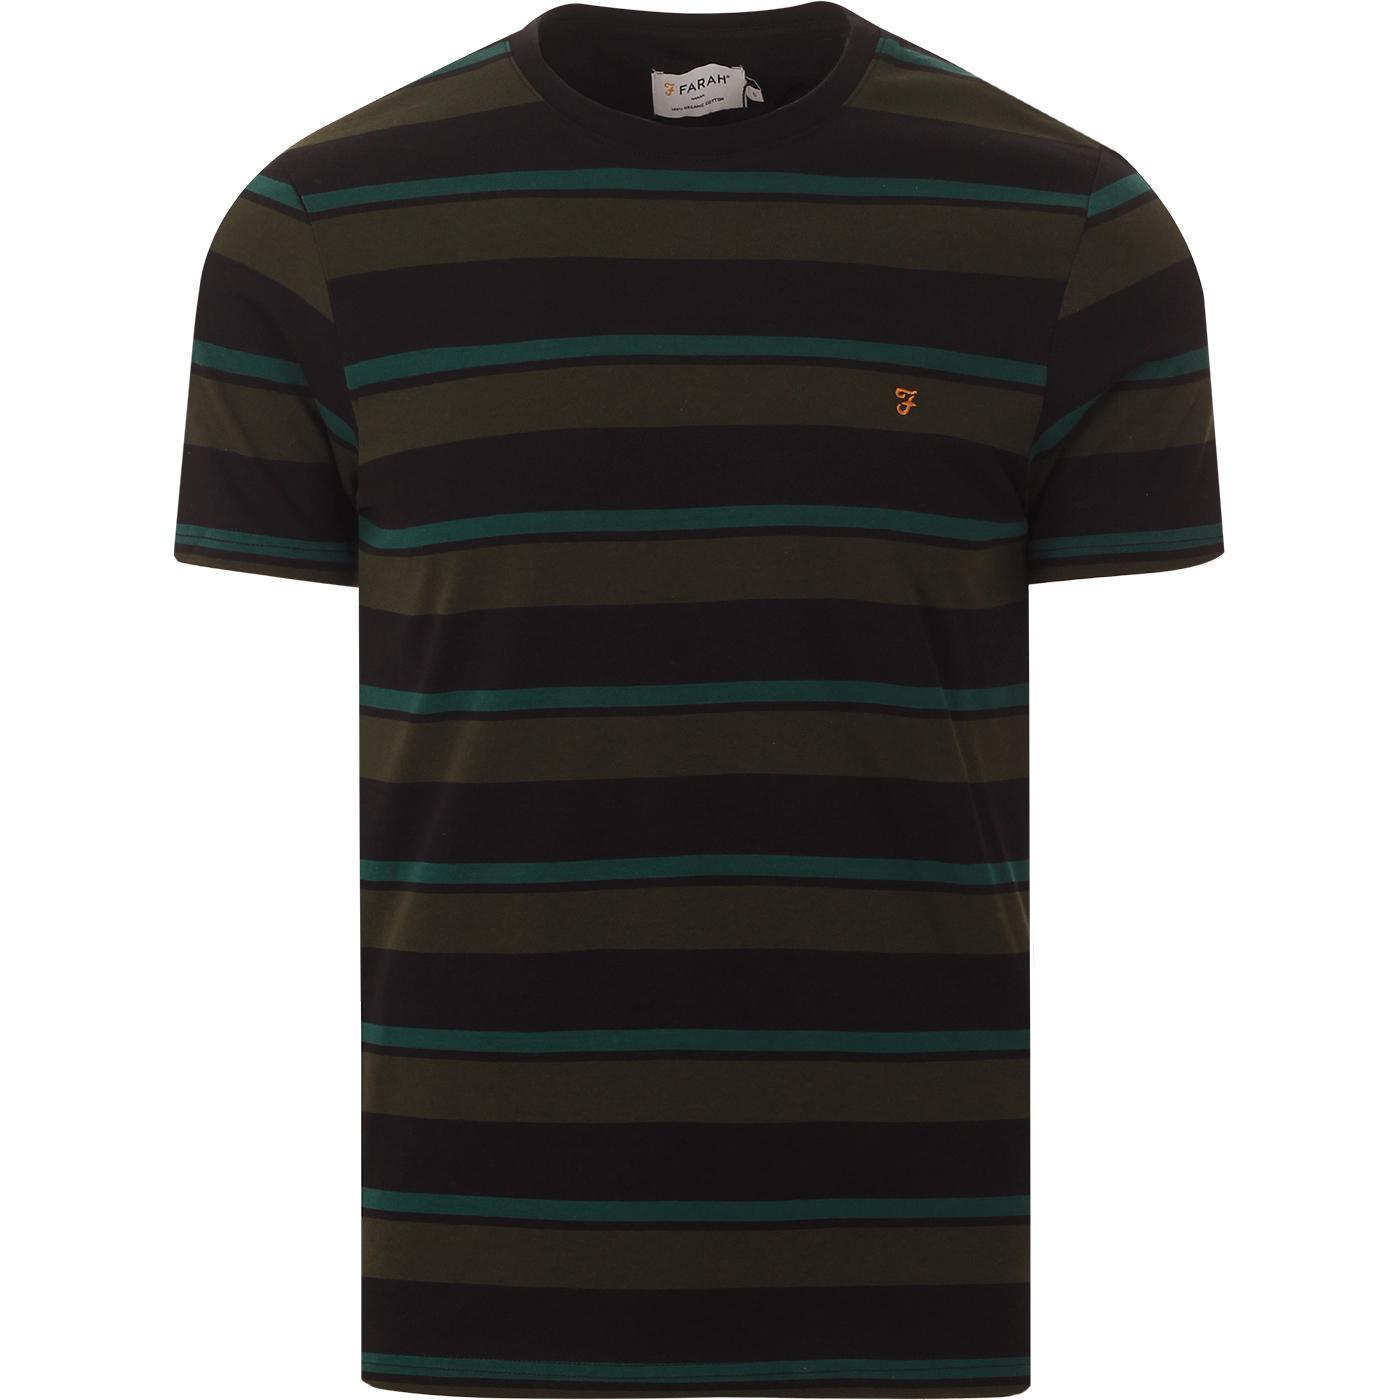 Agawam FARAH Retro Mod Multi Stripe Tee (Black)